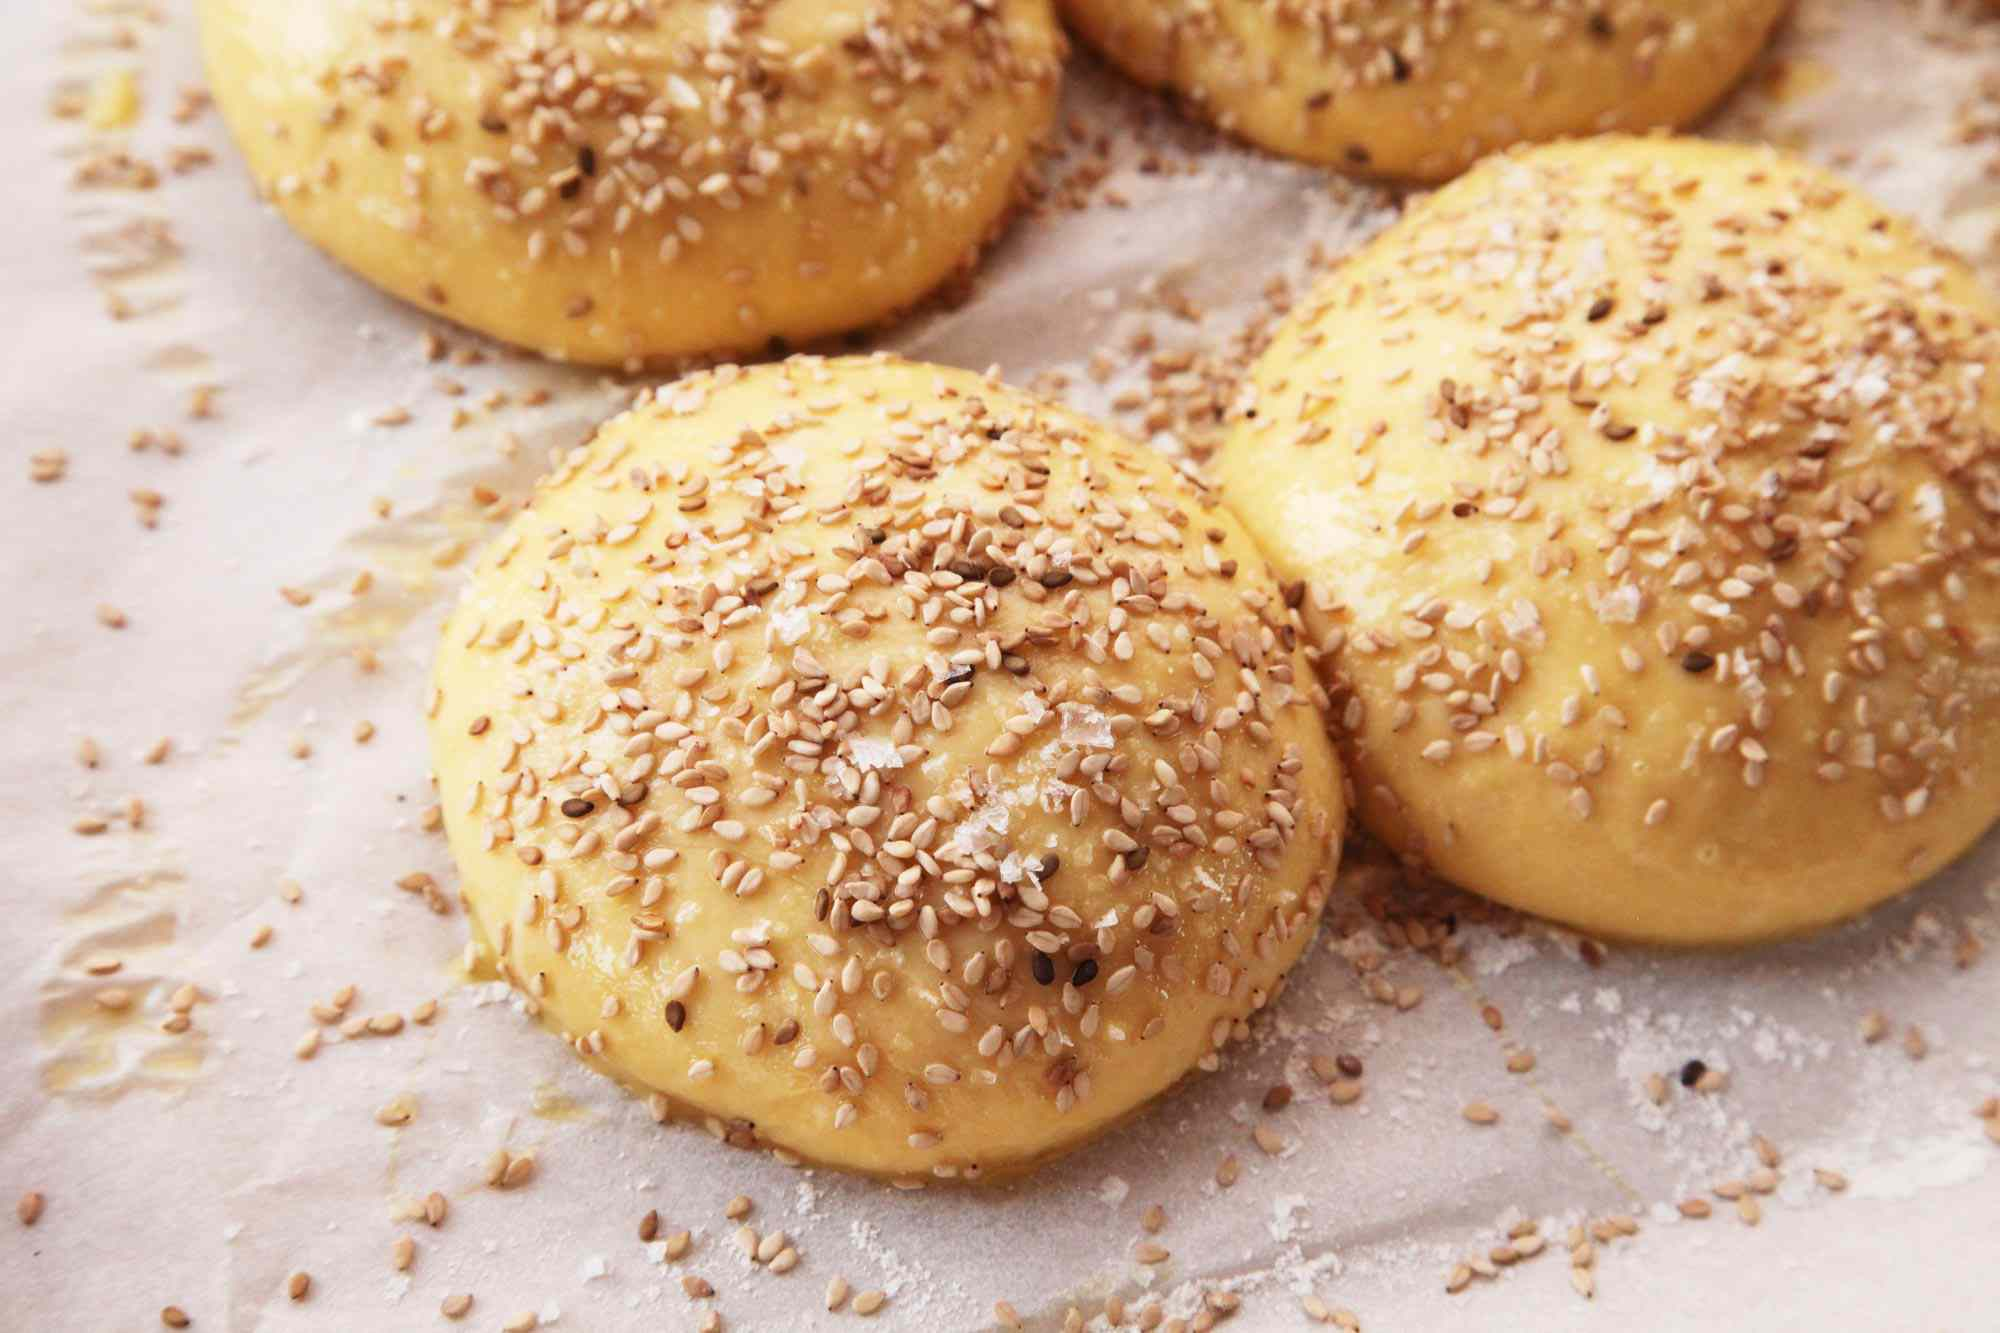 20150422-cemita-rolls-recipe-18.jpg